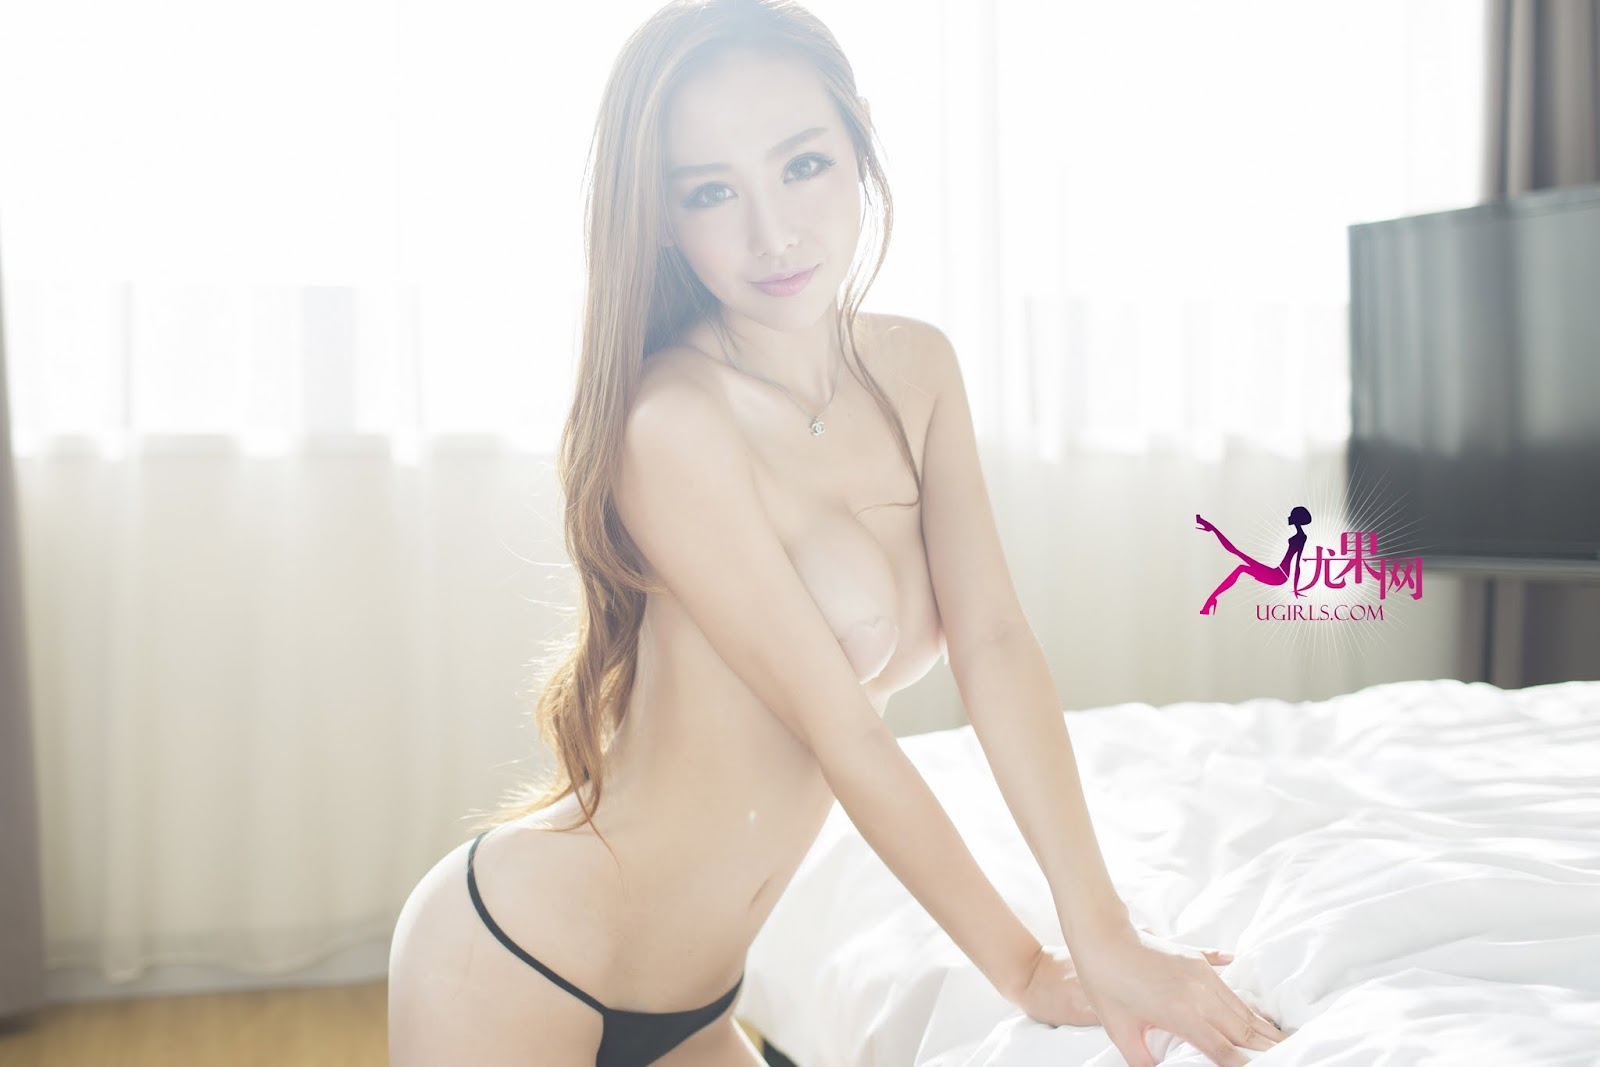 U091%2B%252862%2529 - Sexy Photo UGIRLS NO.91 Nude Girl